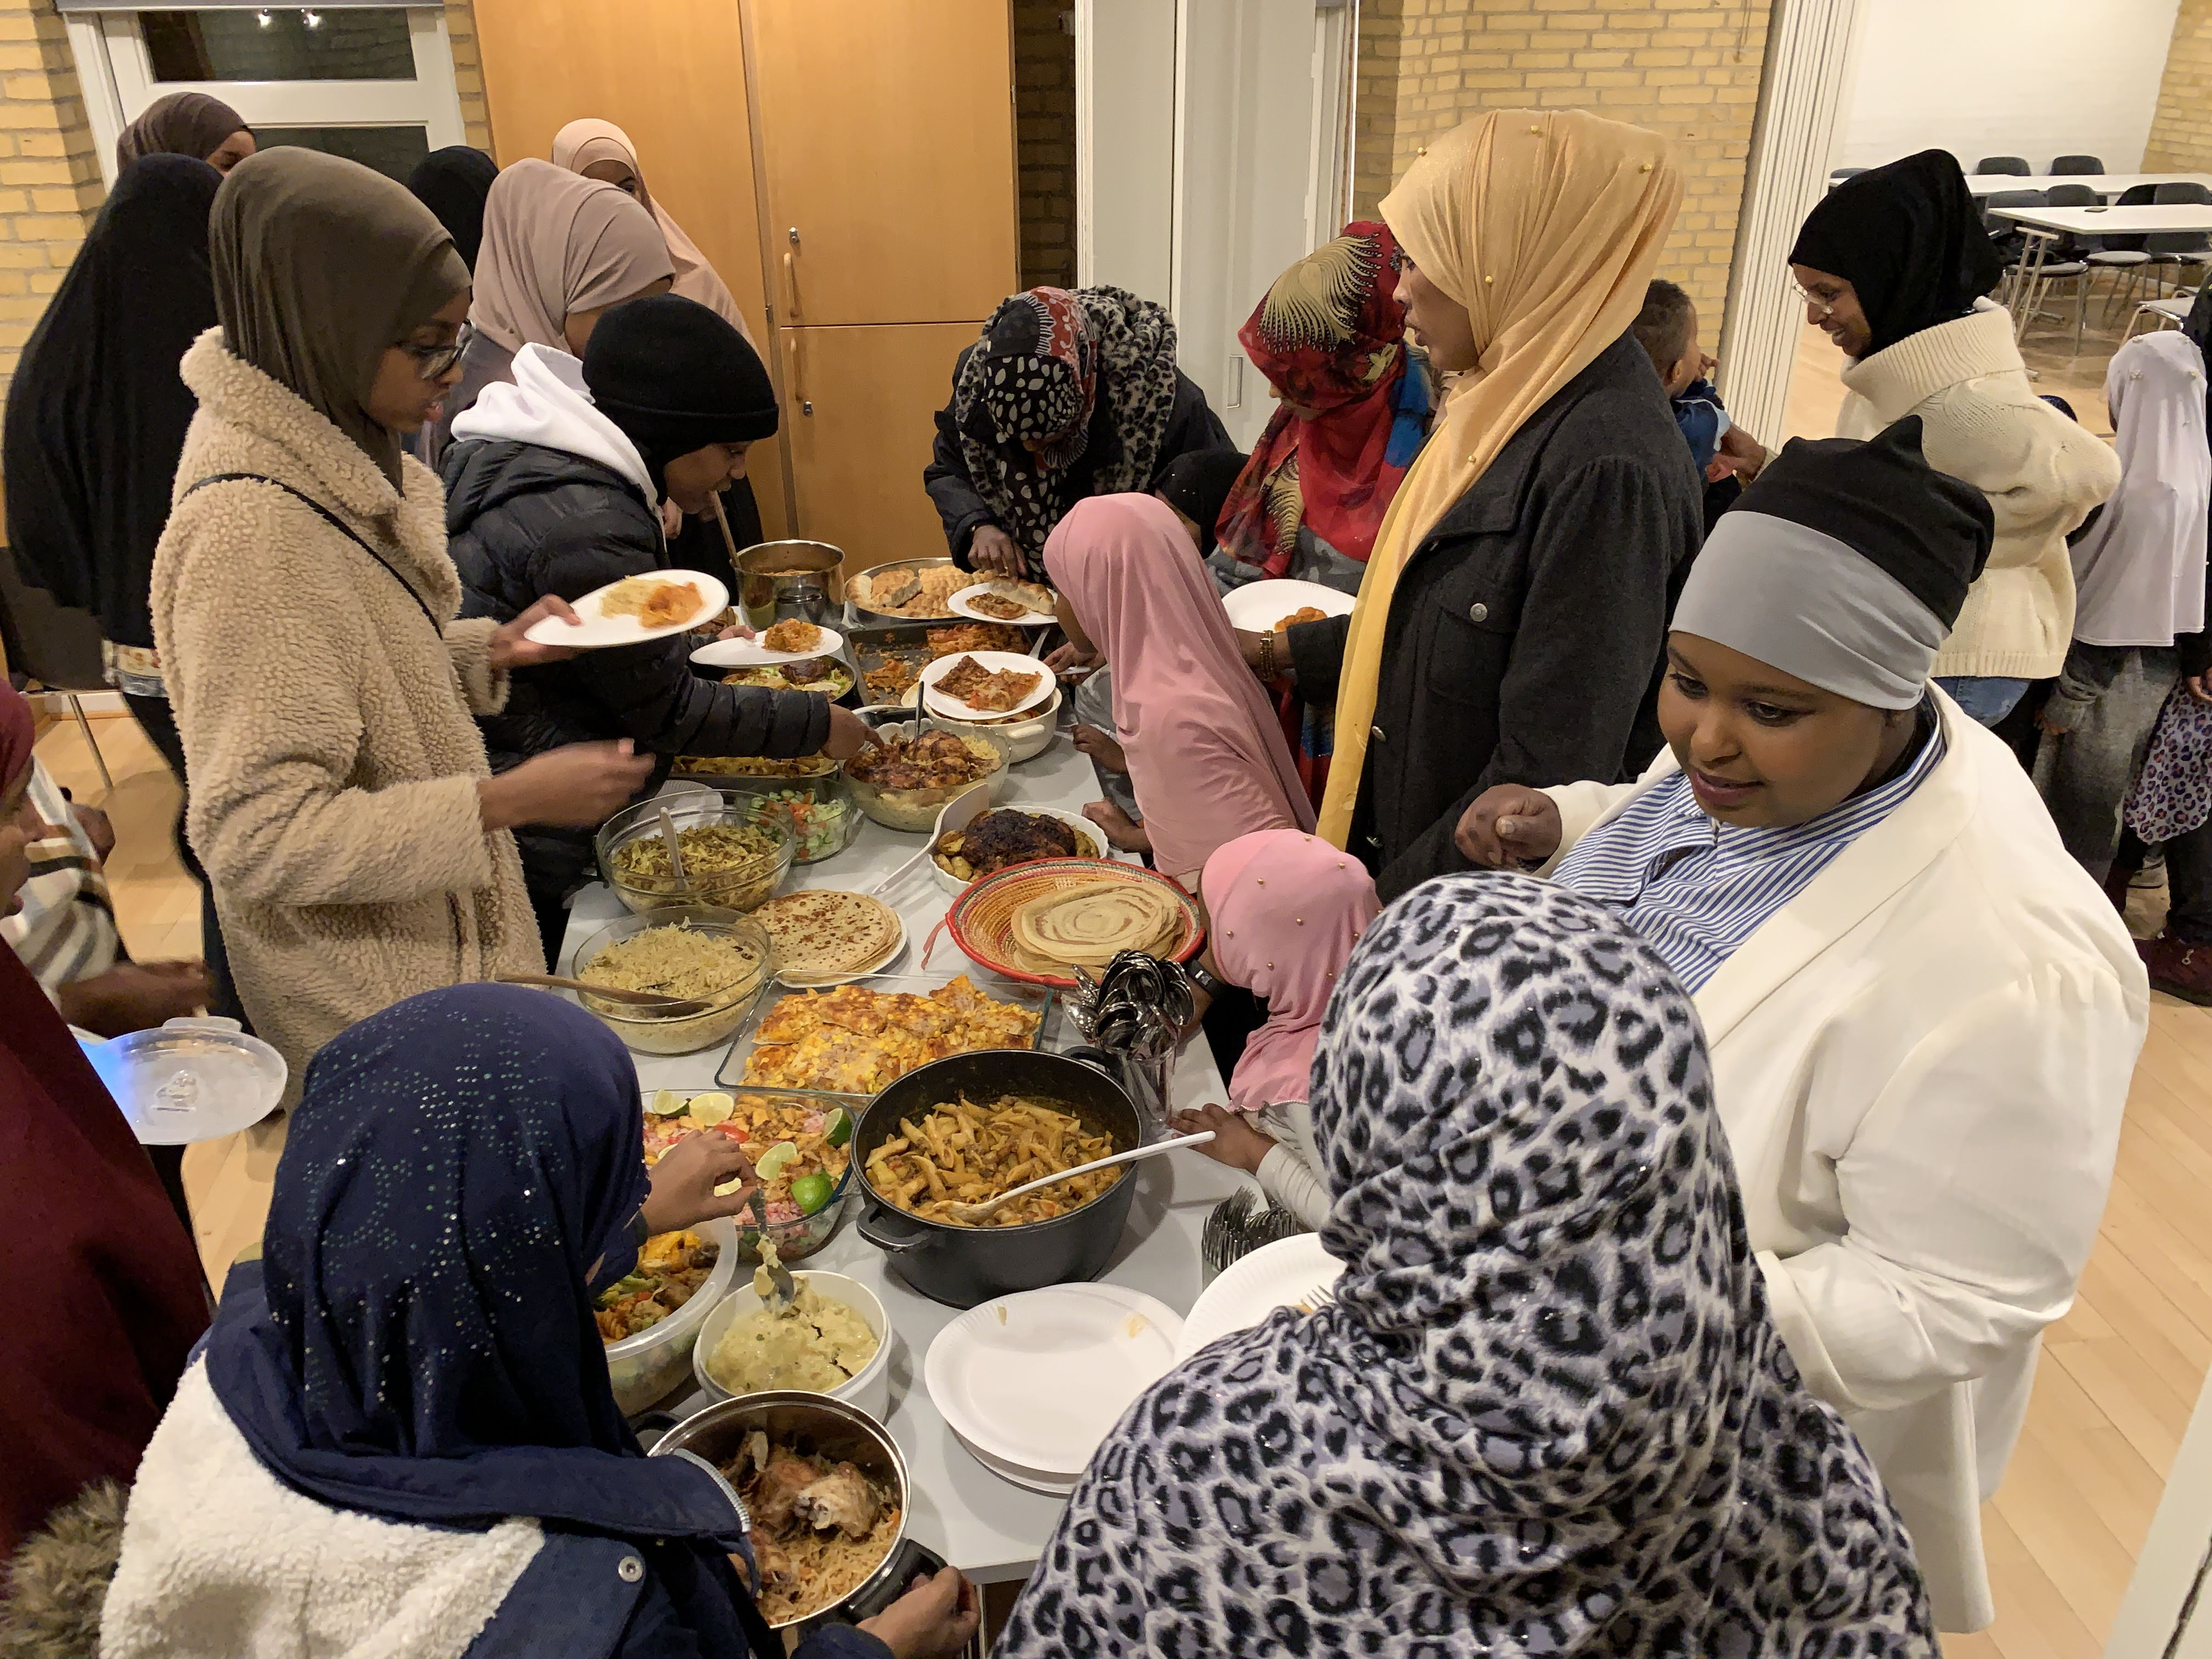 fællesspisning-den-28-12-2019-i-beboerhuset-på-Ellekonebakken-027